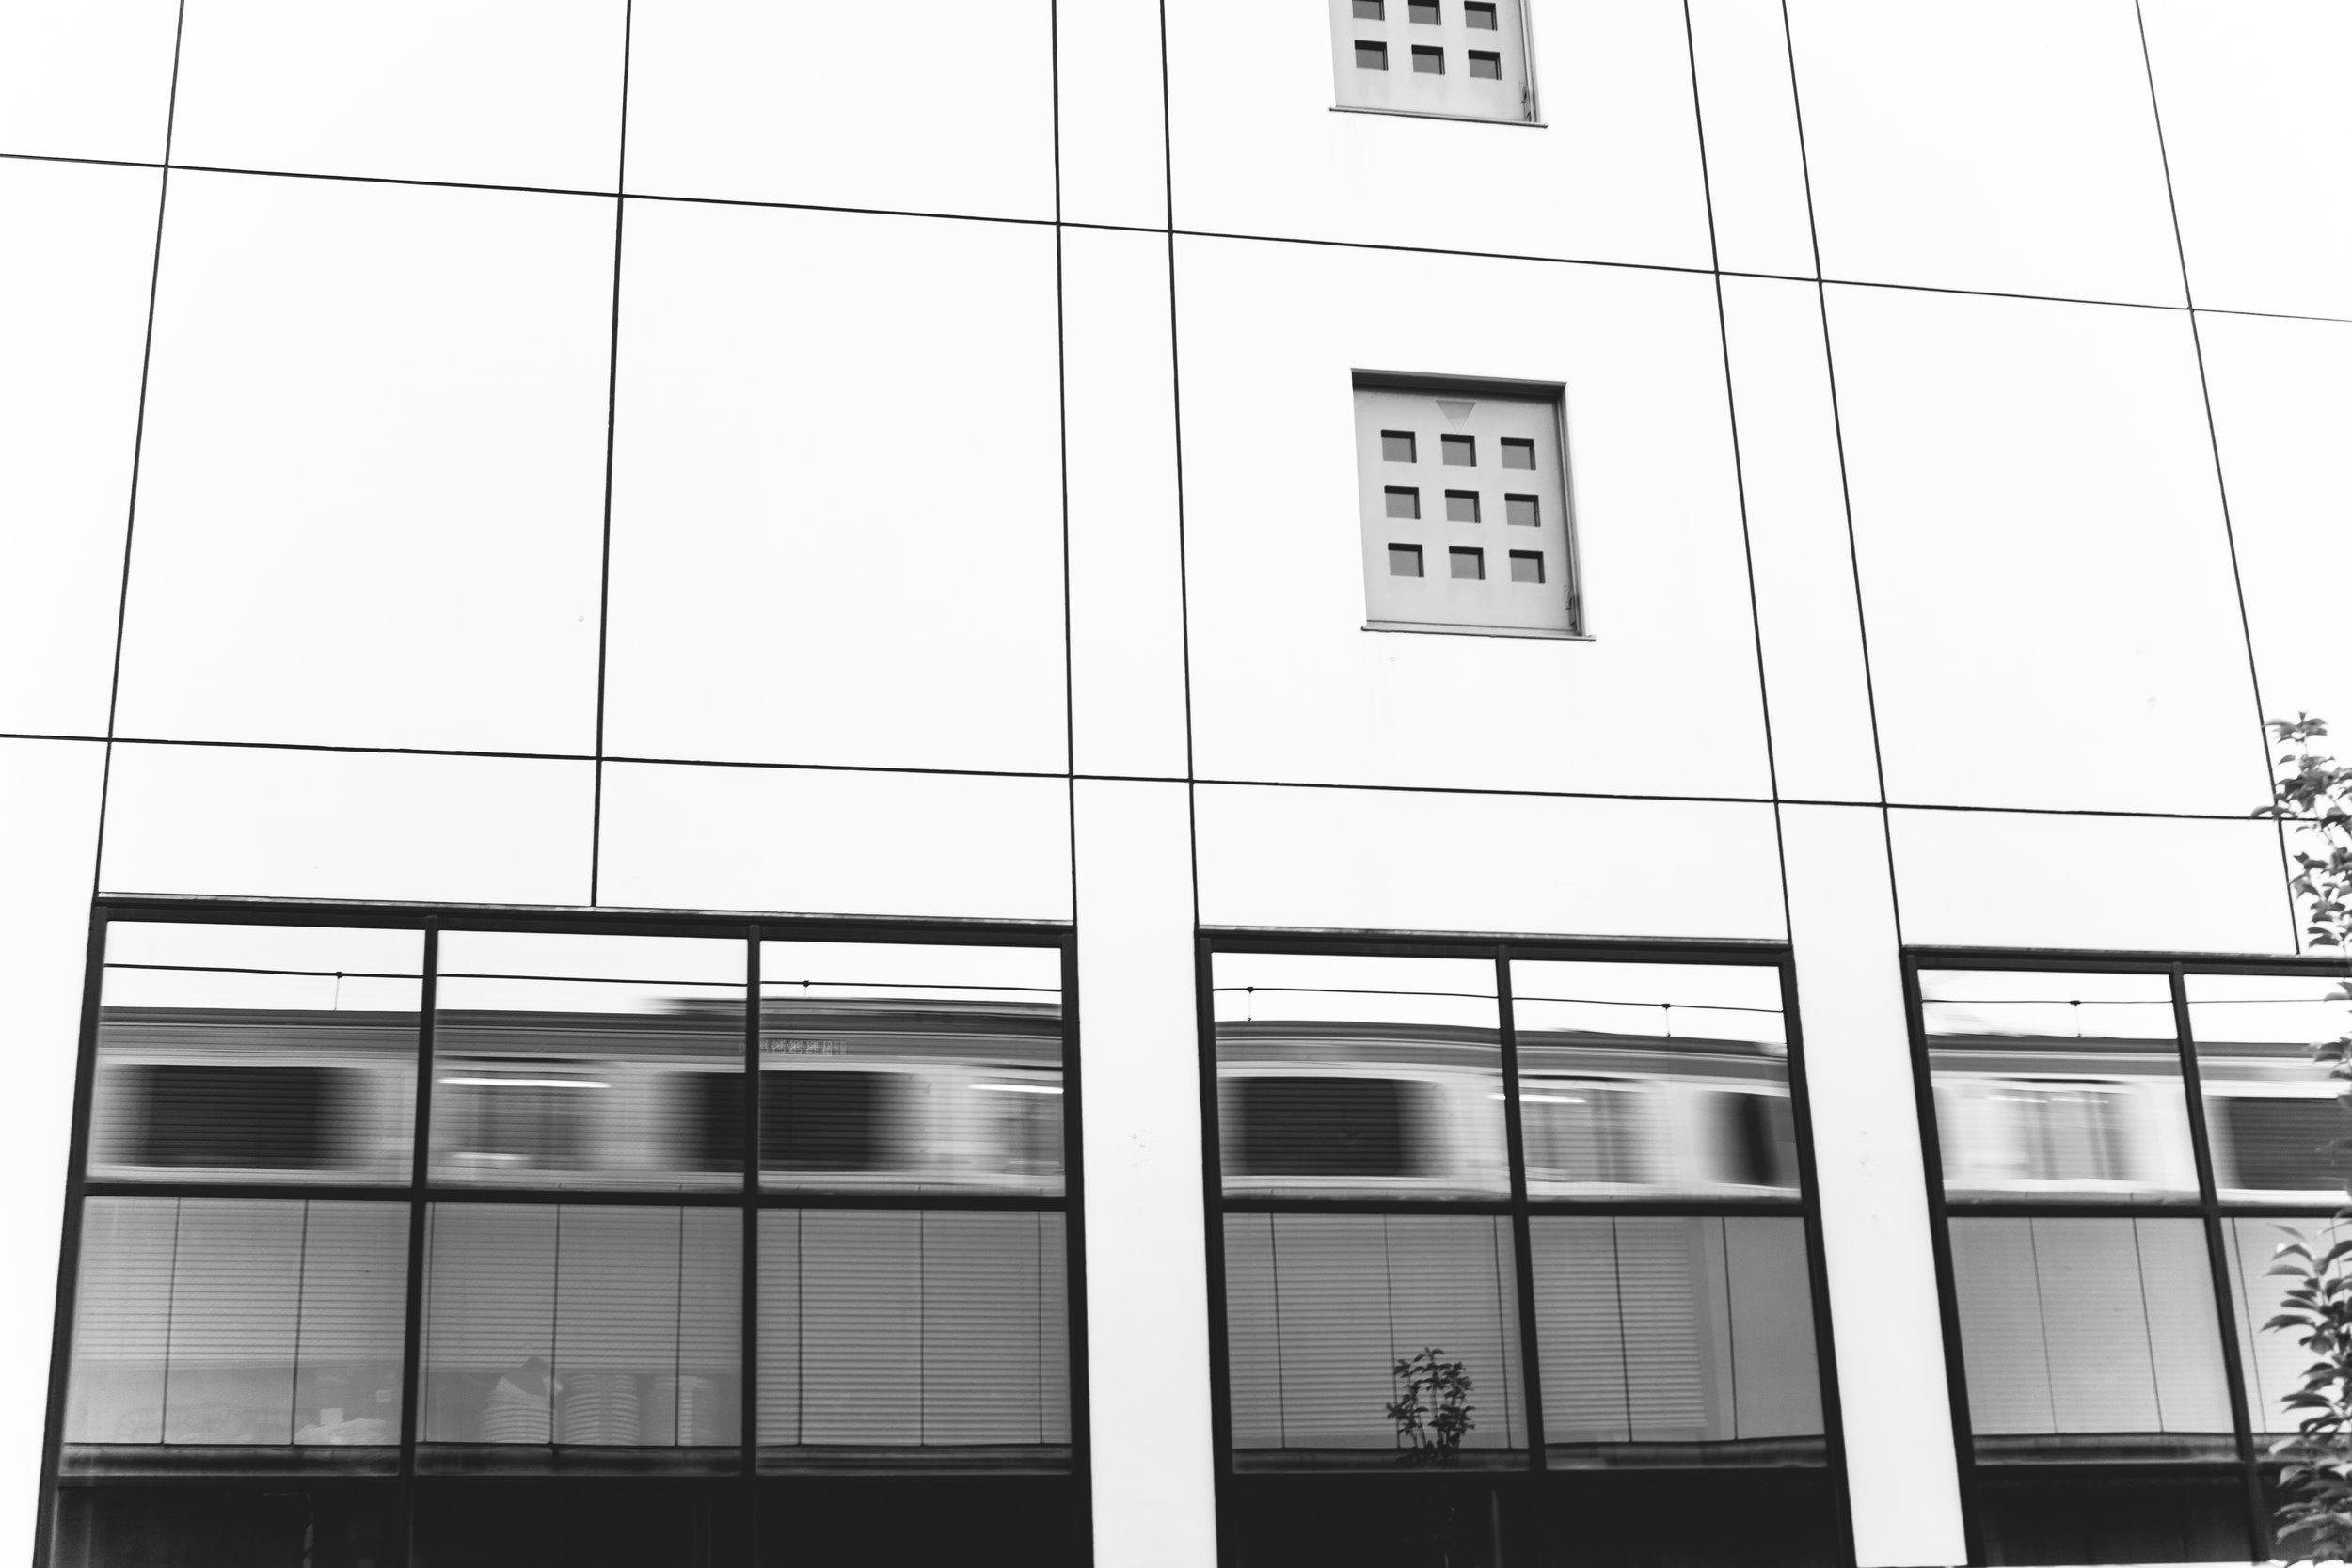 train passing in windows